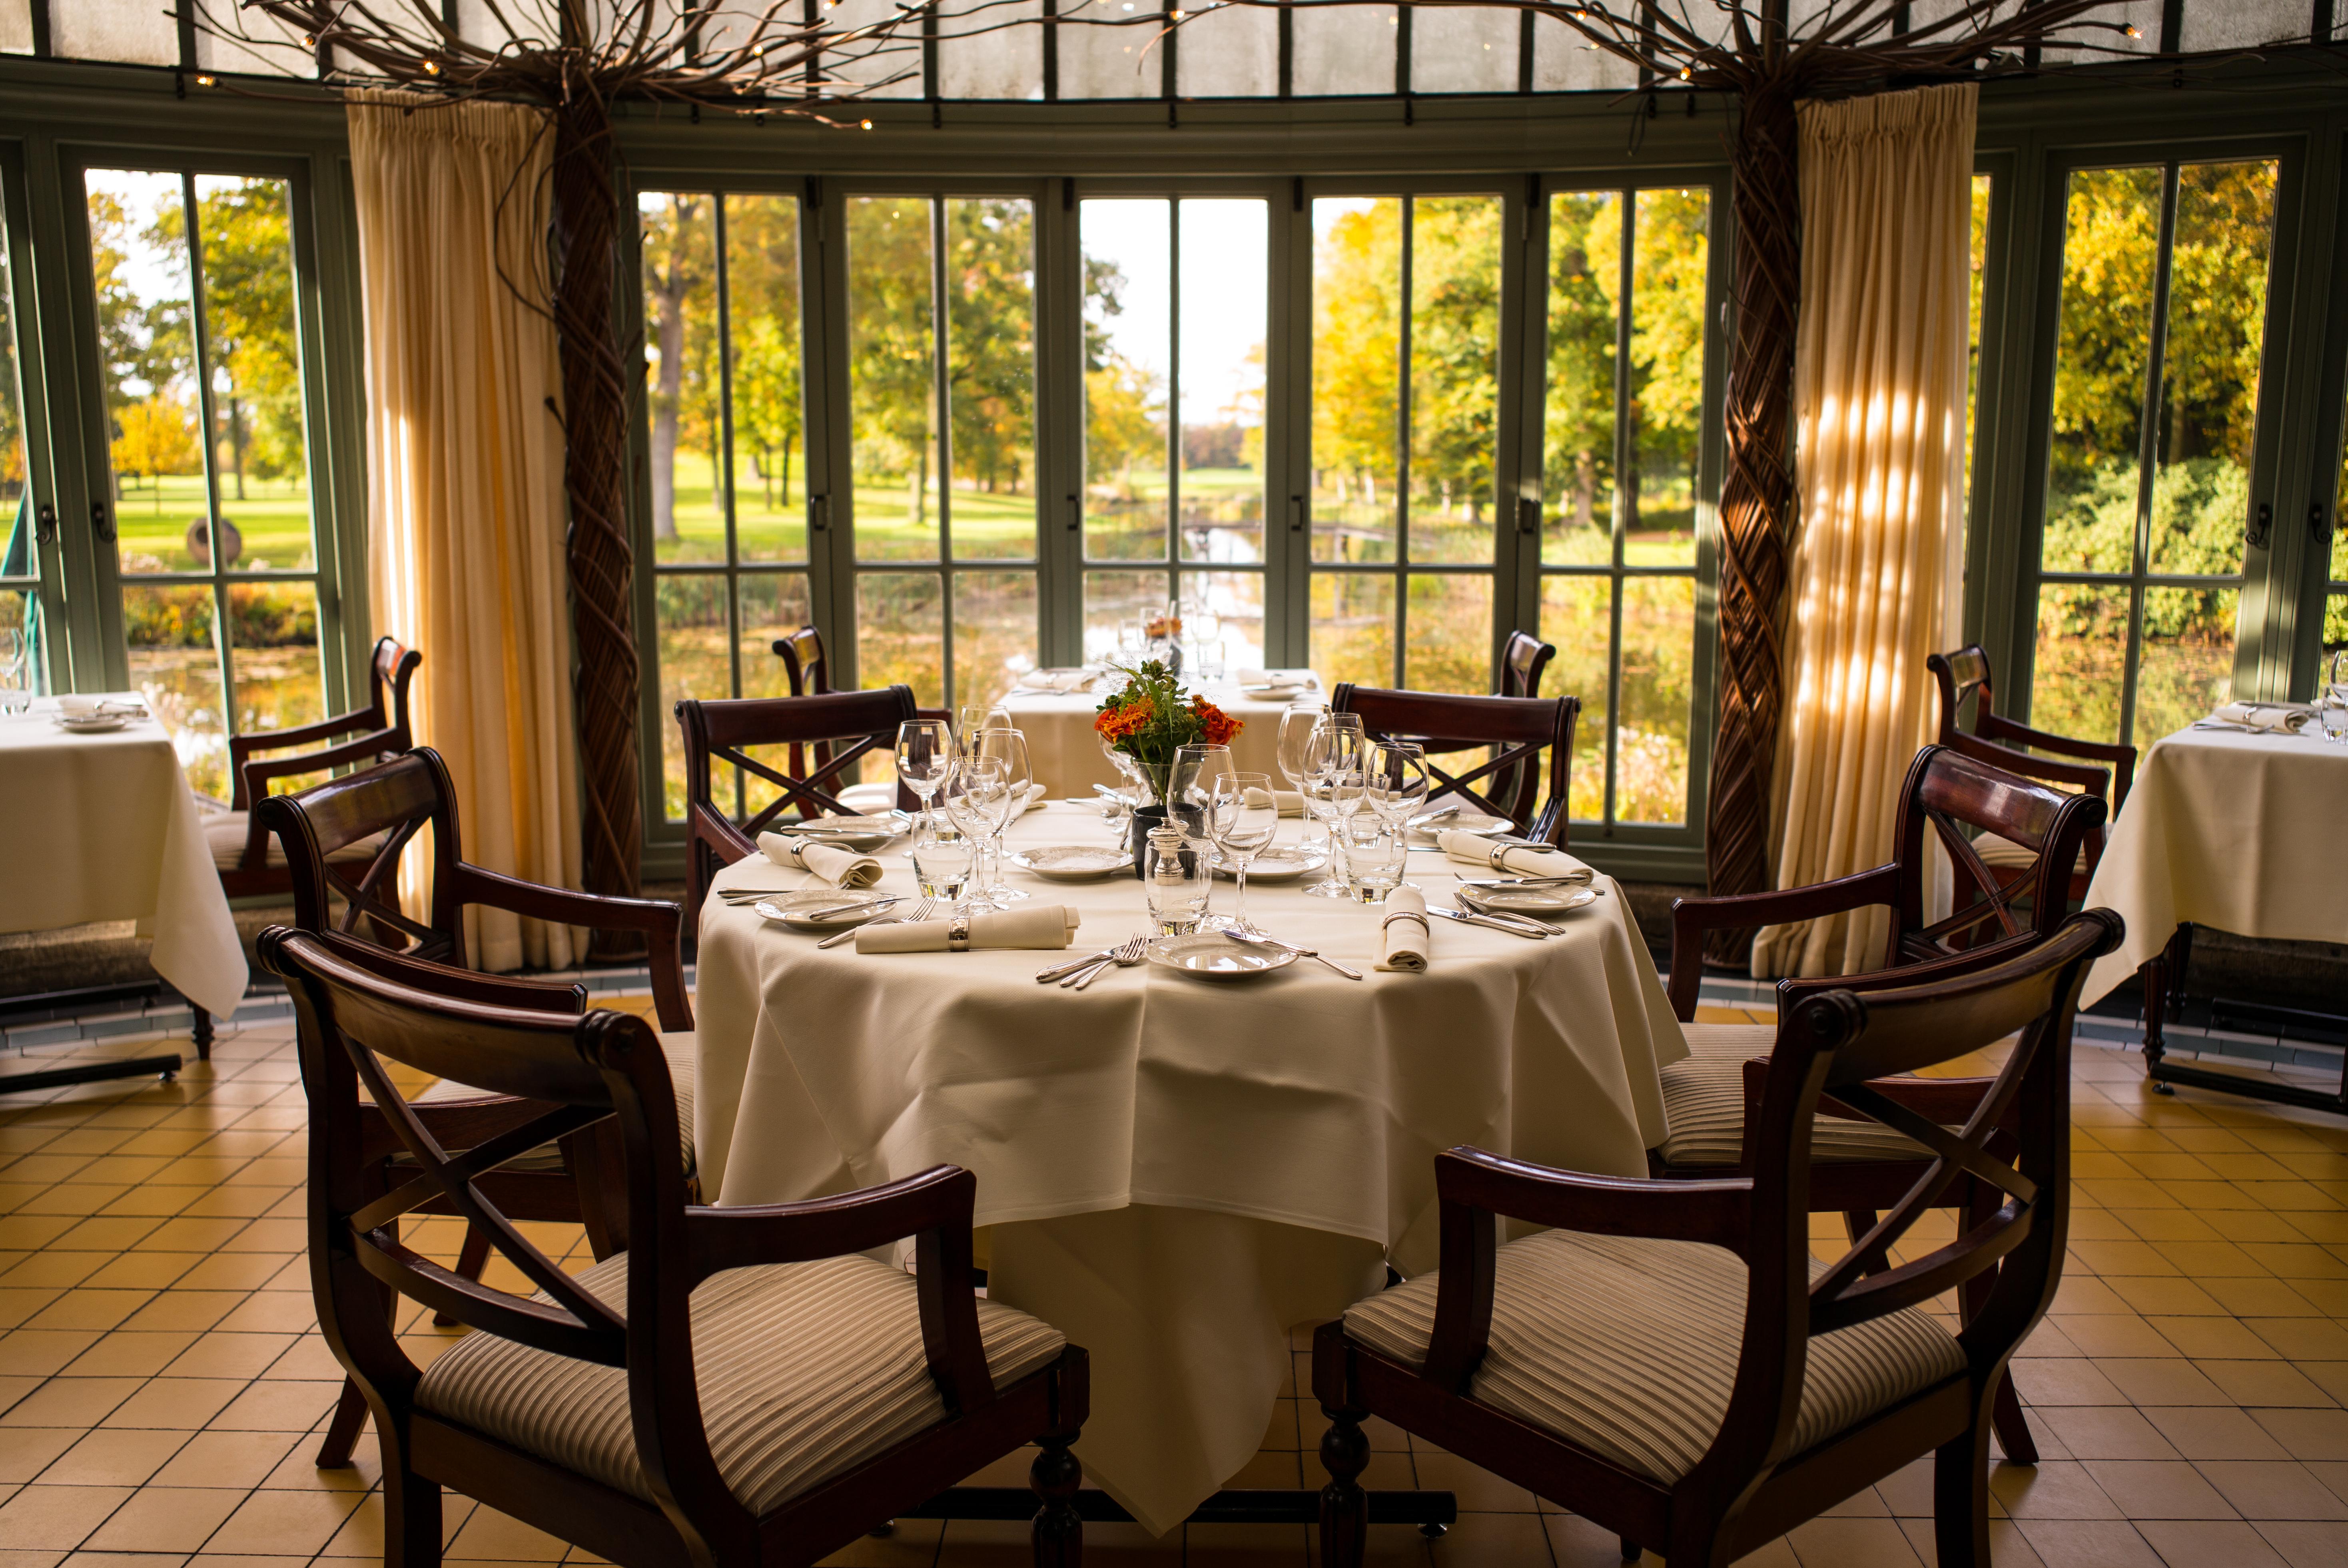 Castle Interior Design Property free images : table, light, mansion, restaurant, home, meal